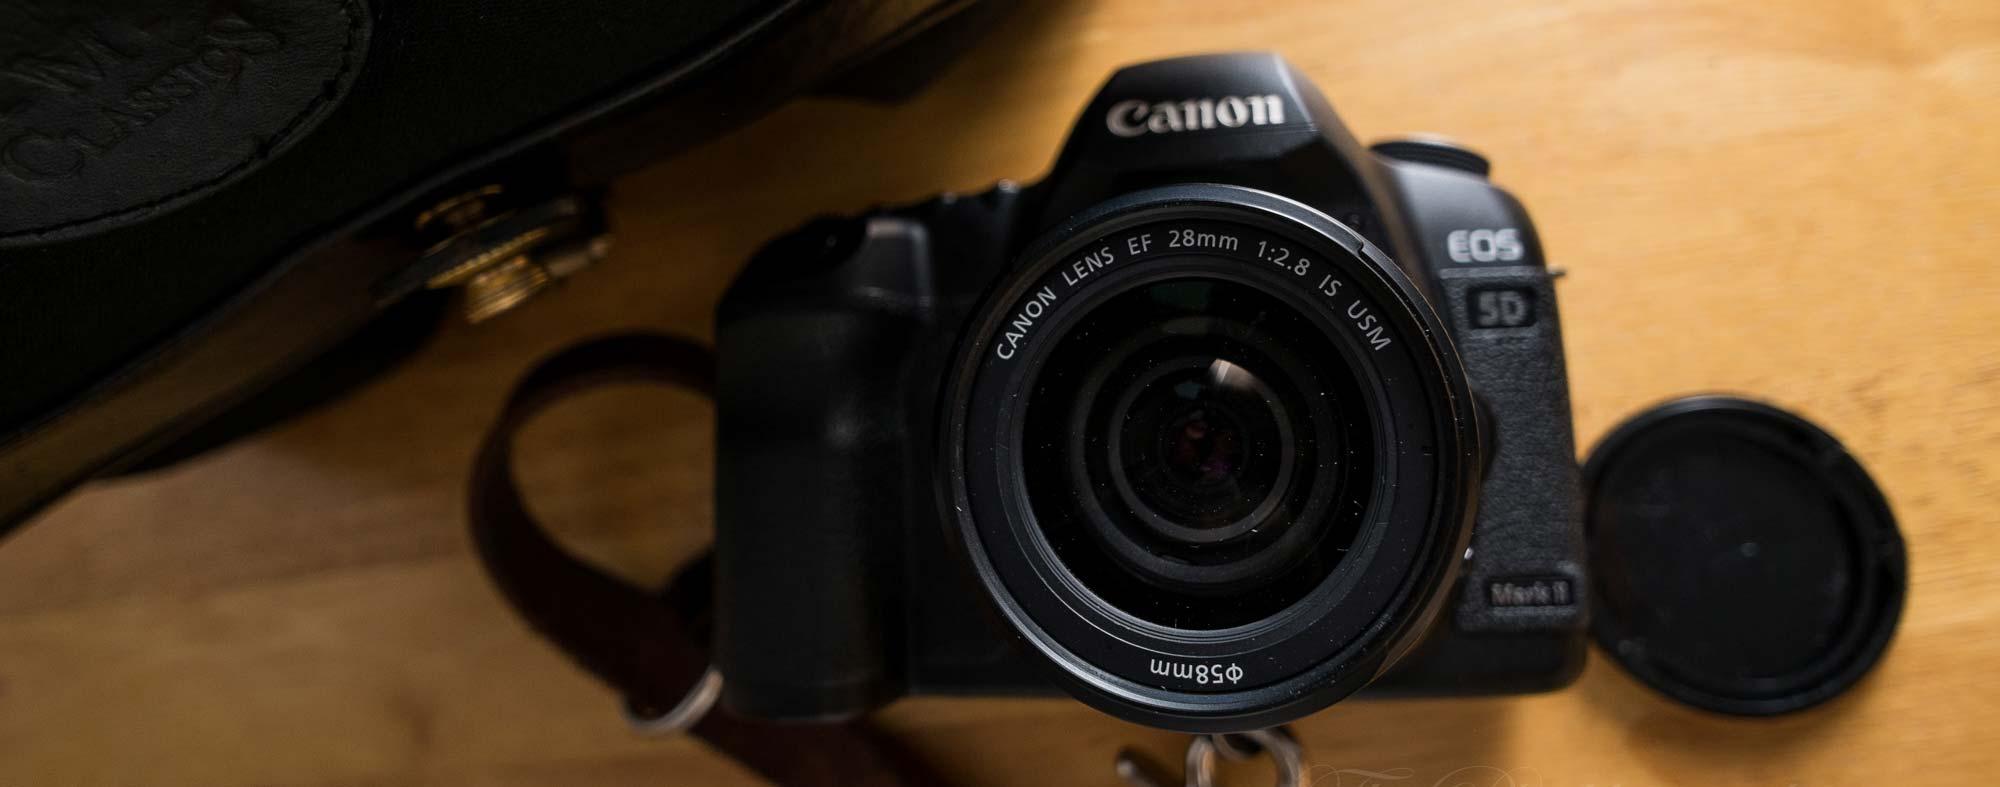 jual Canon EF 28mm f/2.8 IS USM